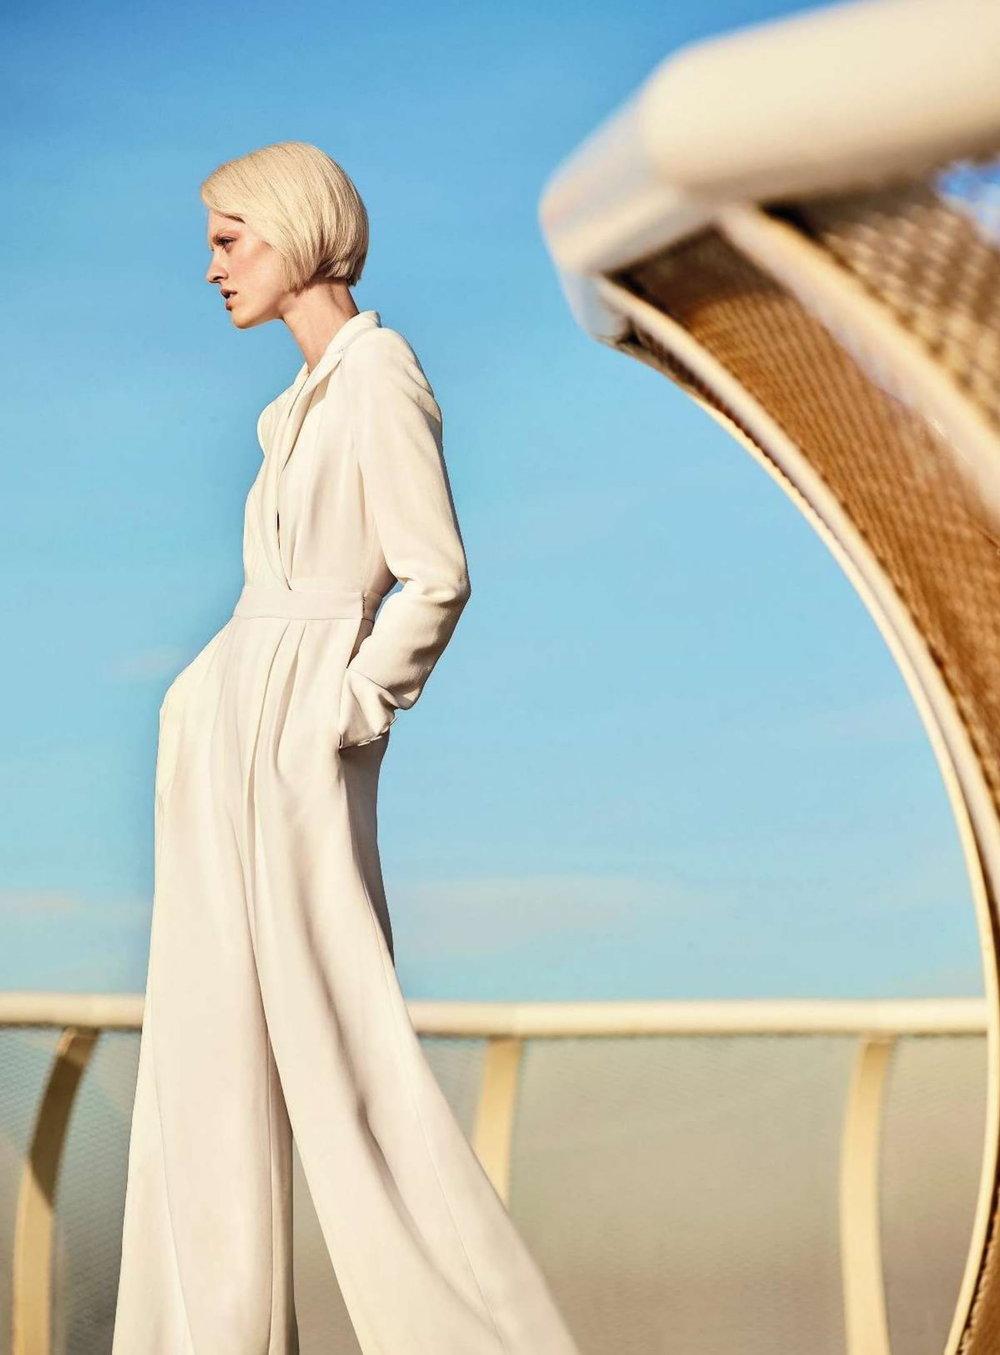 Sarah Brannon by Marcin Tyszka Harper's Bazaar Germany February 2019 (9).jpg